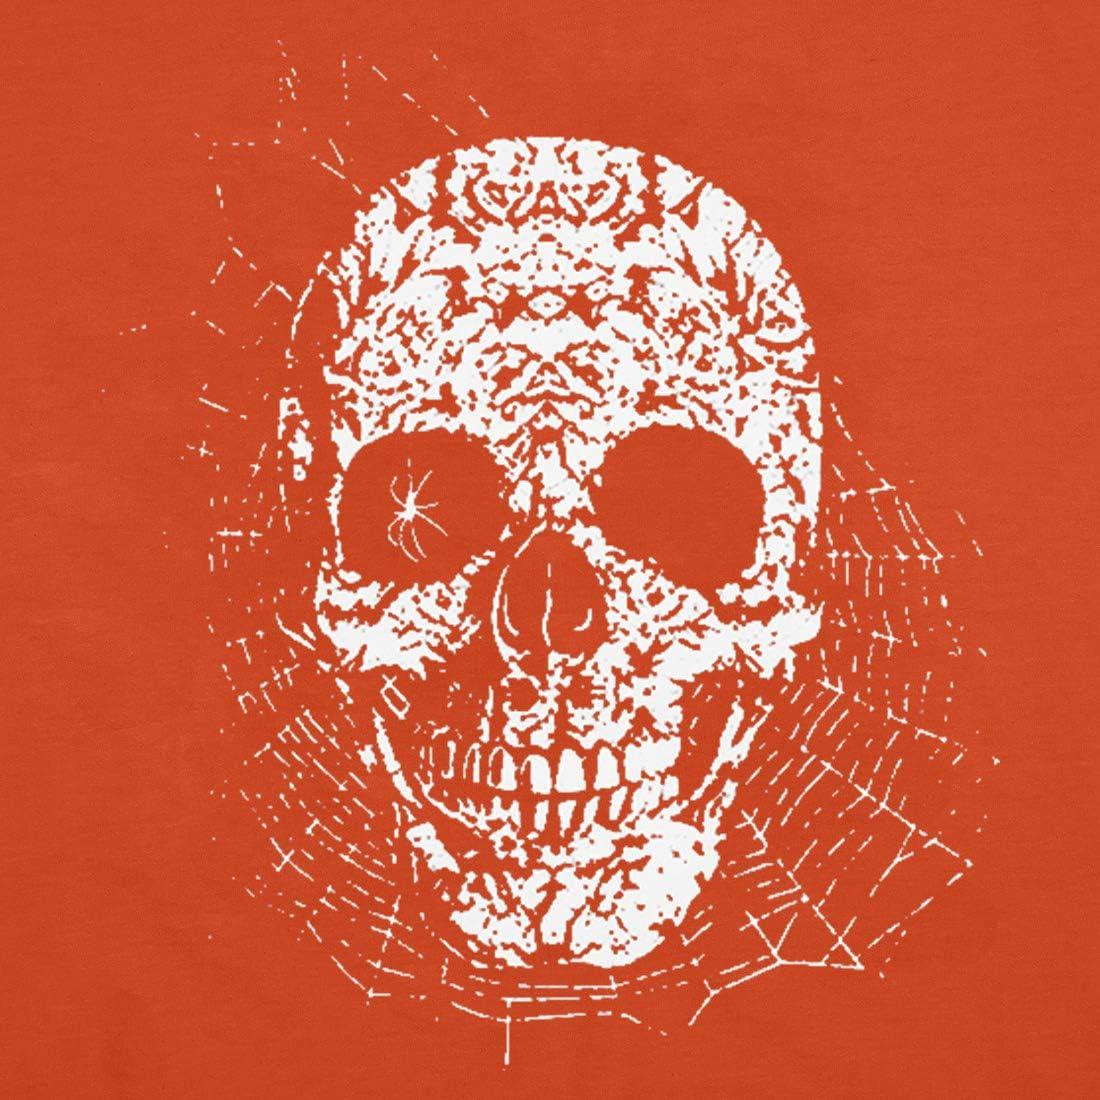 MOUSYA Skeleton Shirt Women Halloween Graphic Tees Skull Printed Halloween T-Shirt Novelty Halloween Shirt